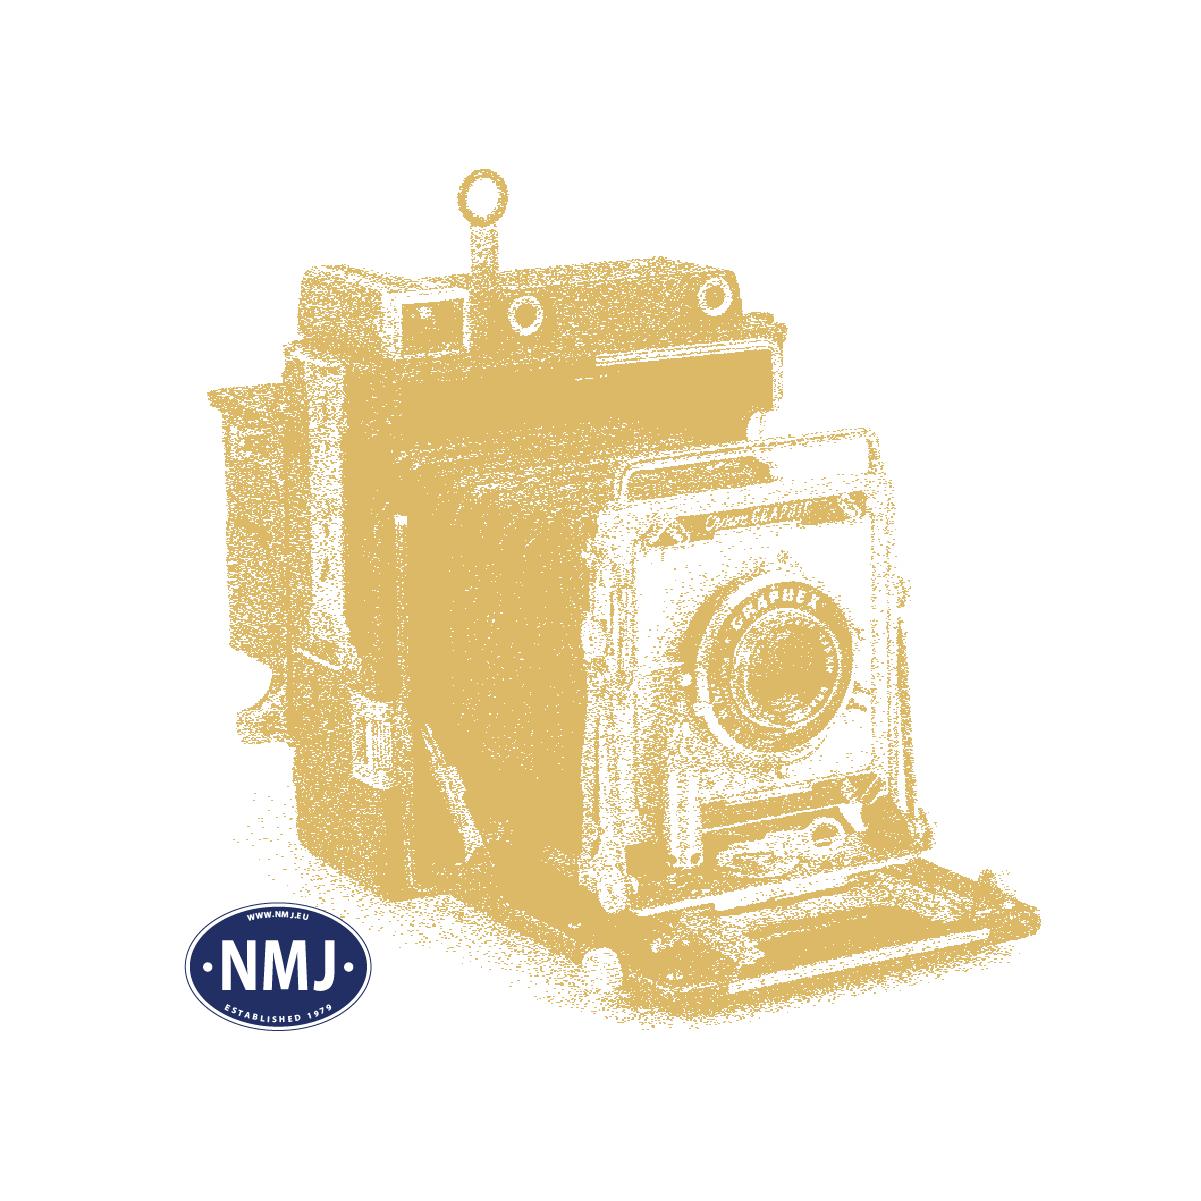 NMJT90007 - NMJ Topline NSB Di3a 609, Gammeldesign, DC